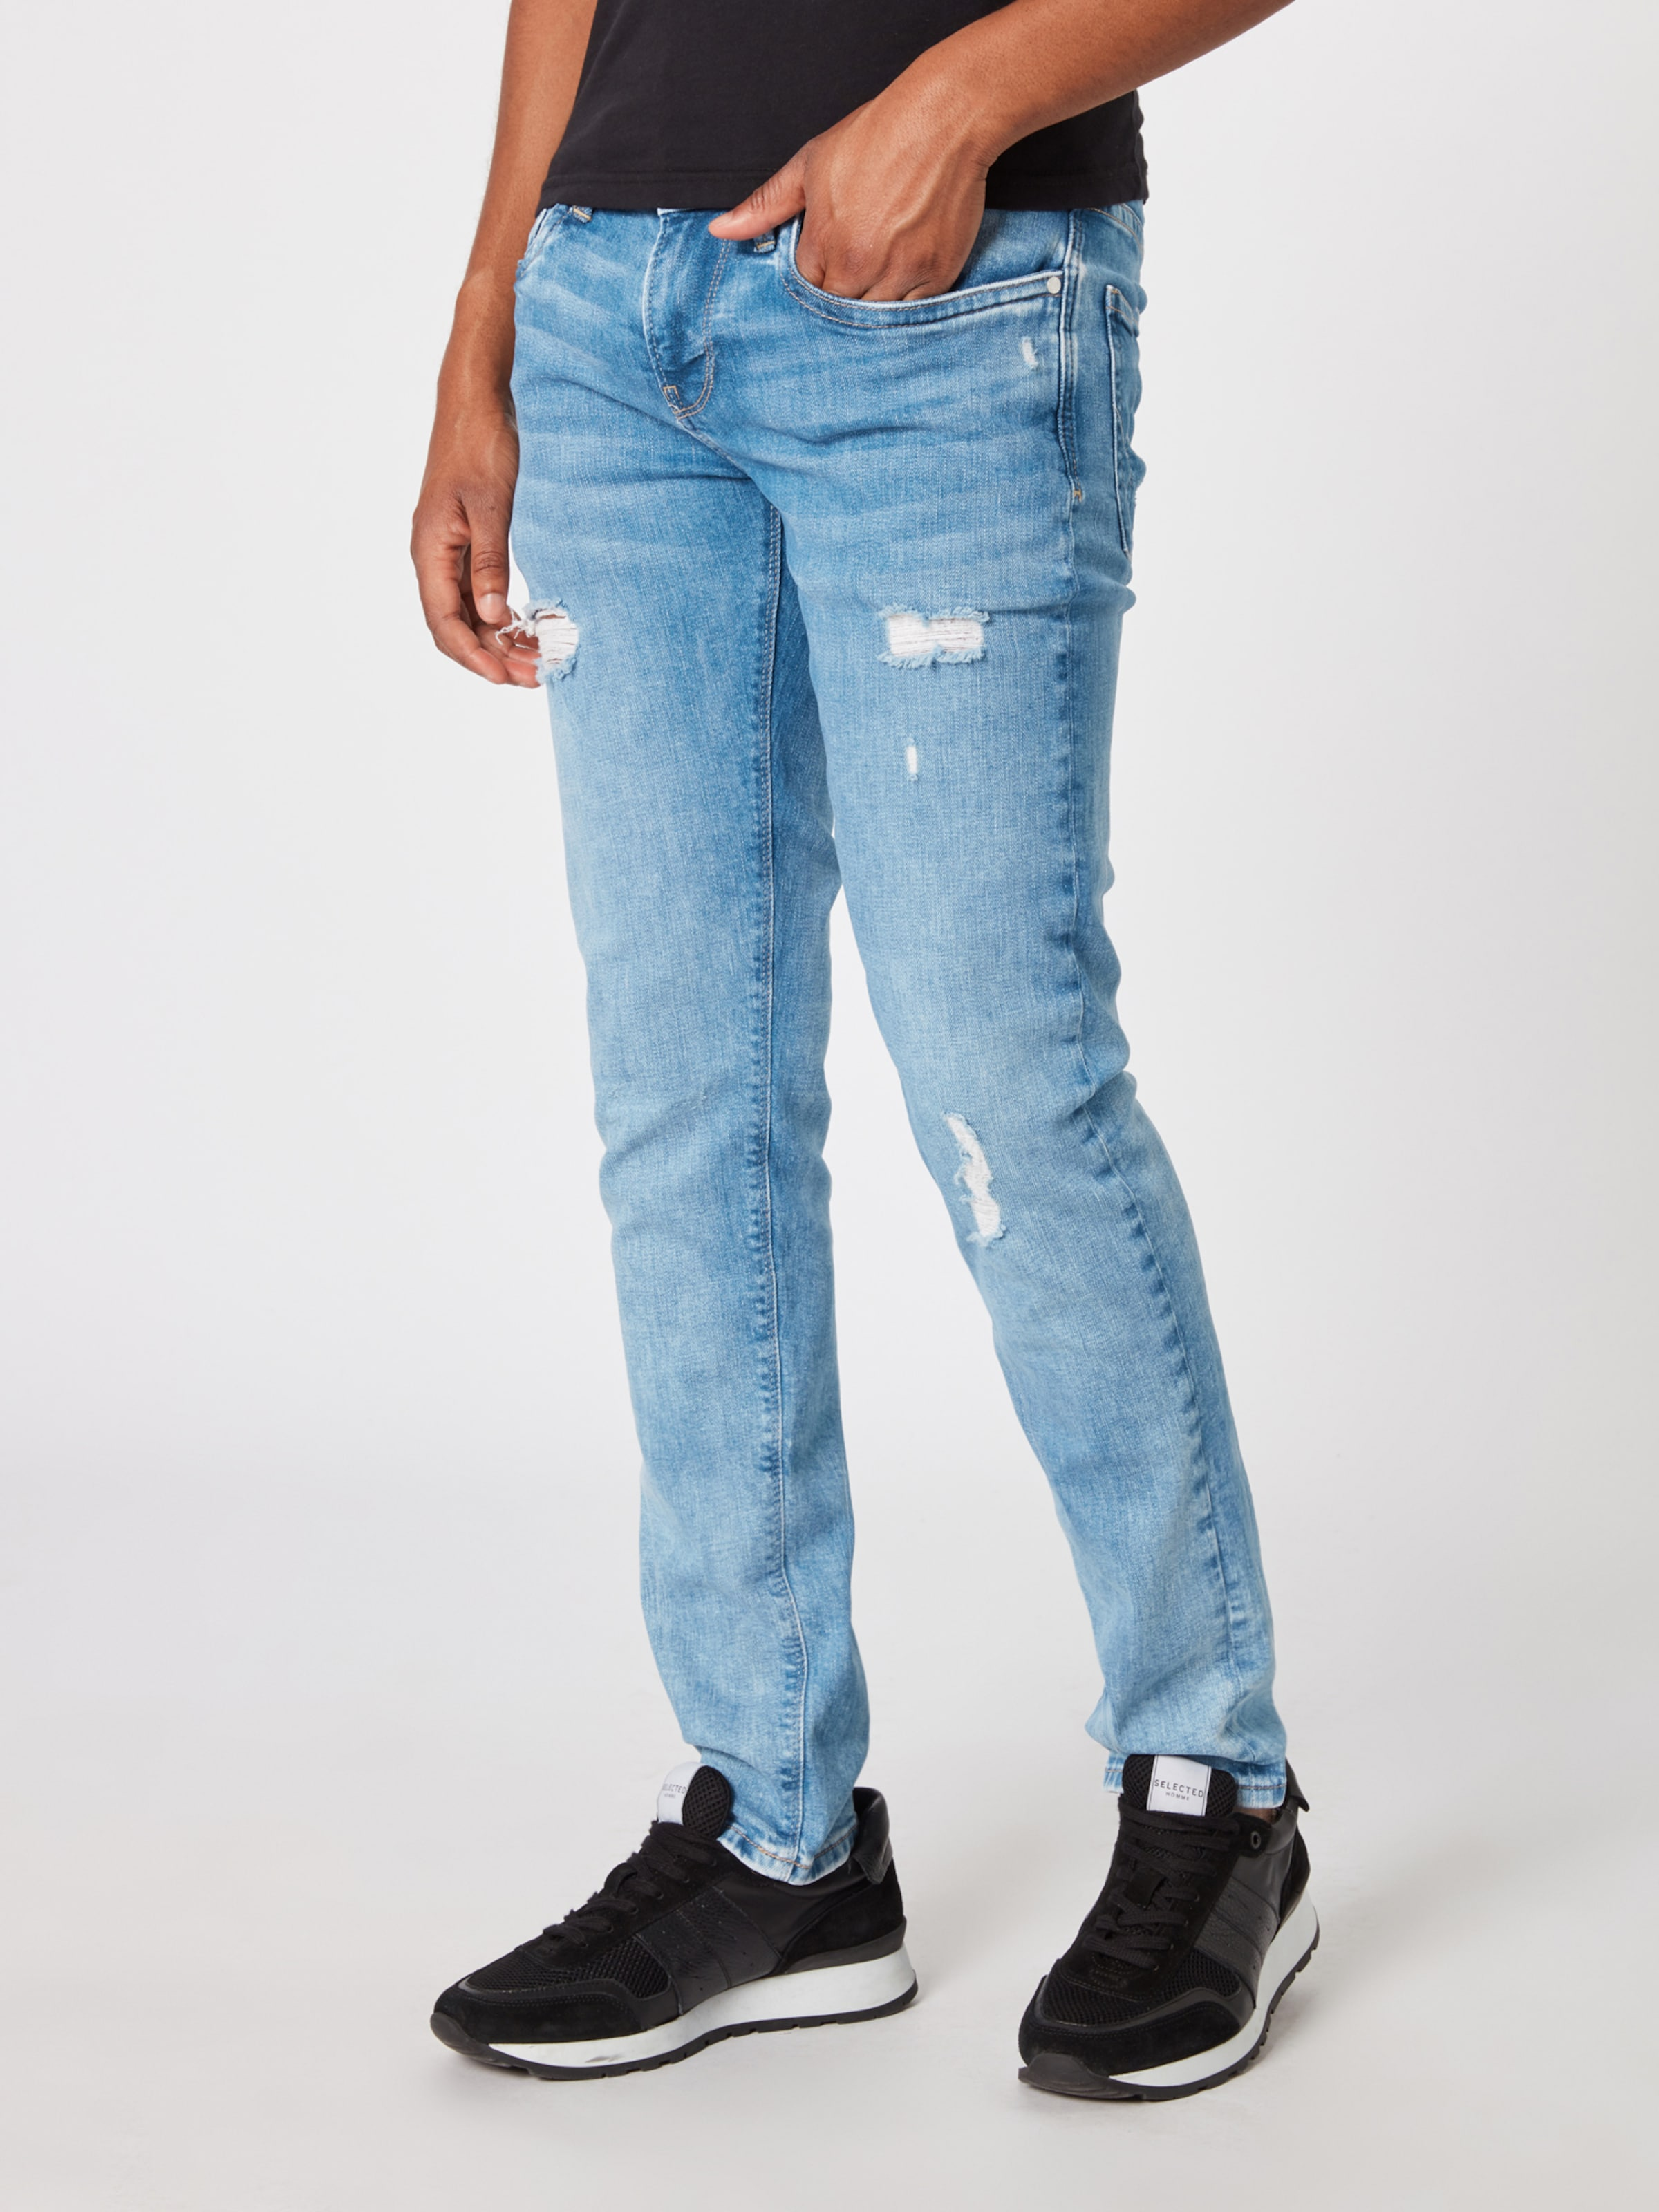 'hatch' Blauw Jeans Denim In Pepe 7gvYbfy6